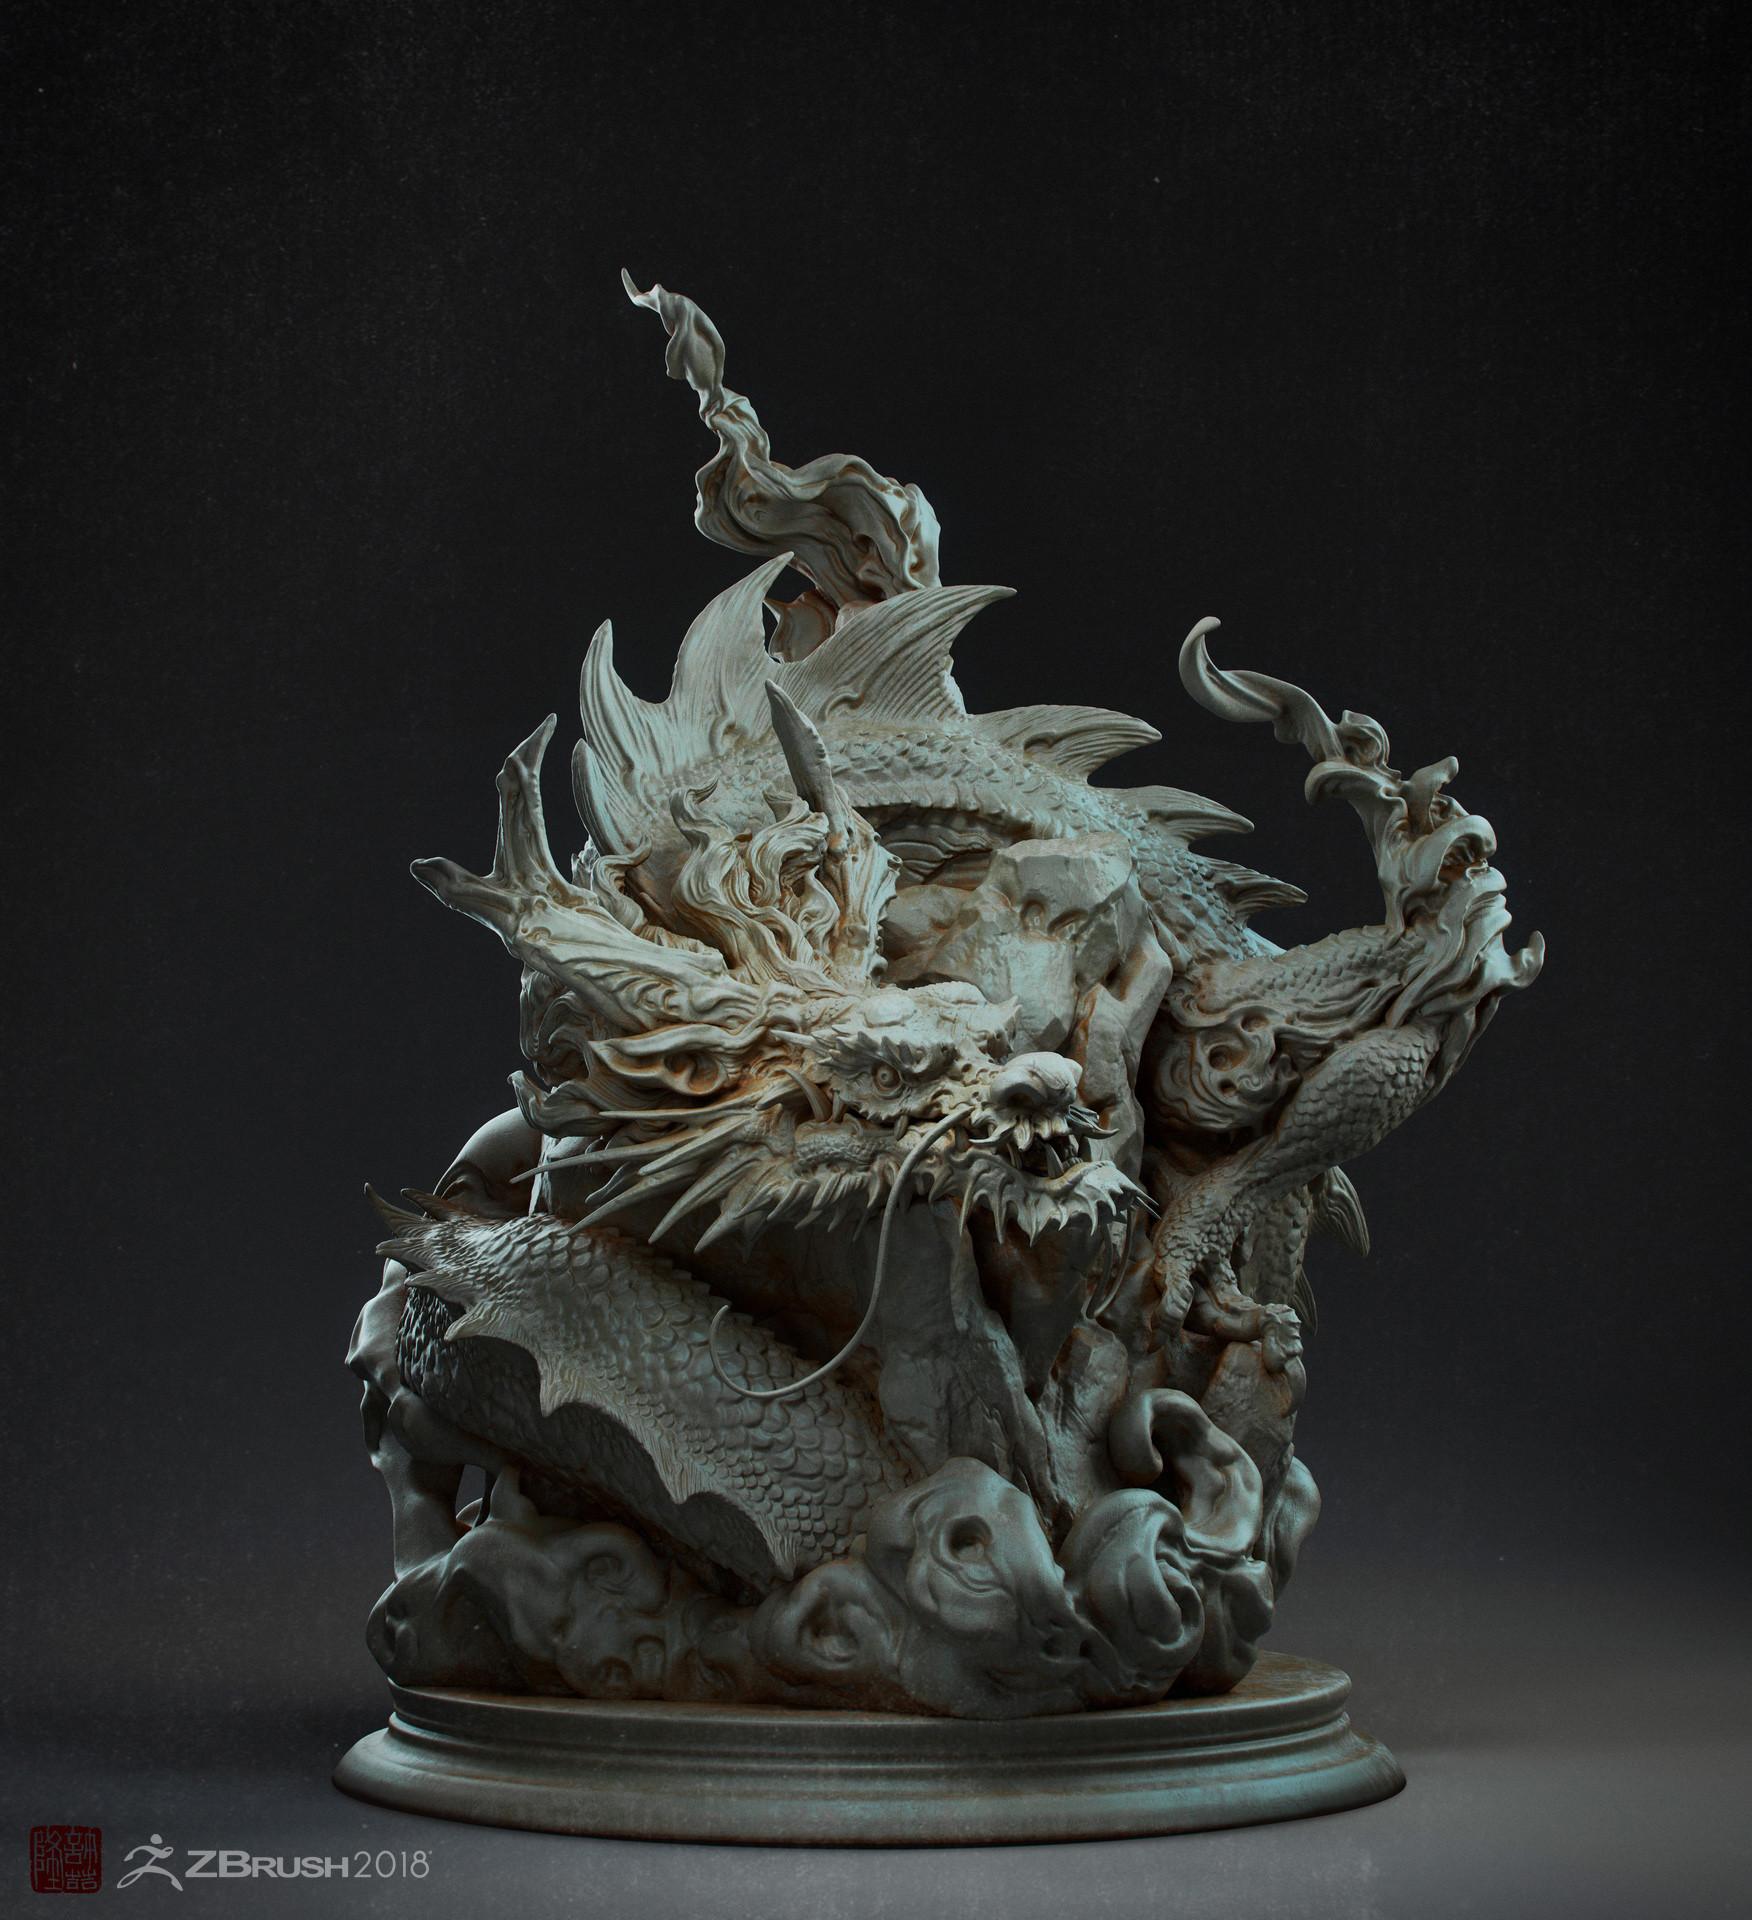 Zhelong xu chinese dragon statue001